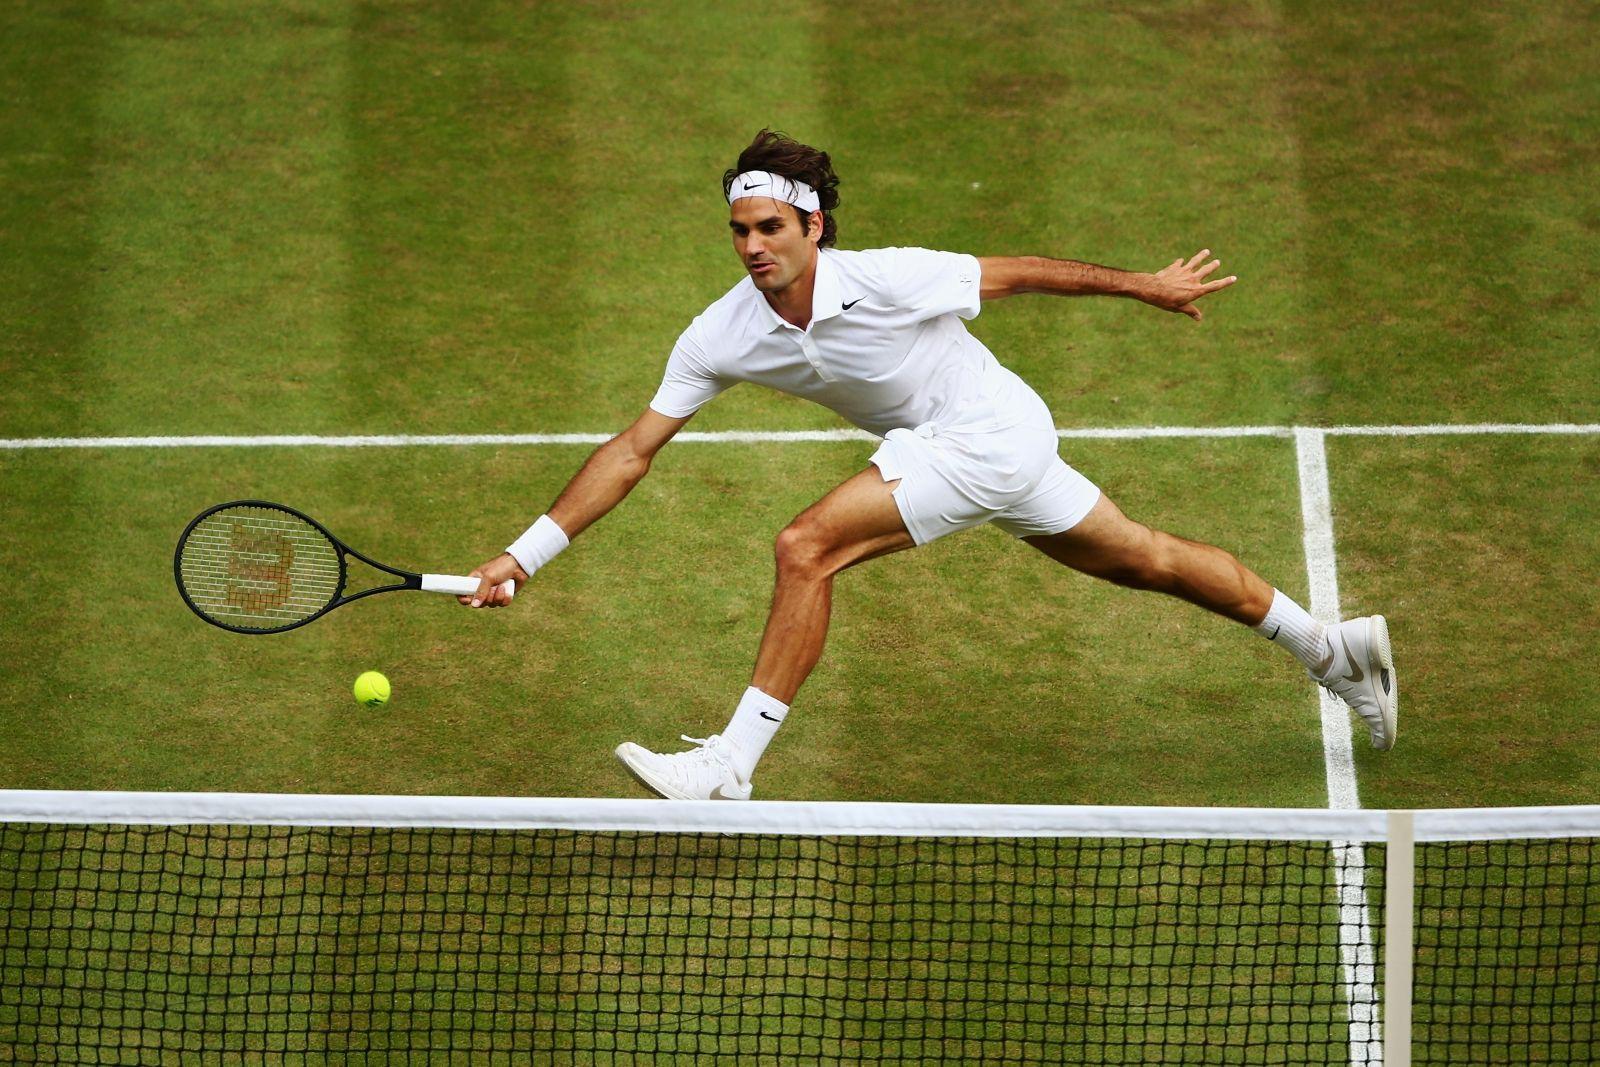 Roger Federer vs Novak Djokovic at Wimbledon